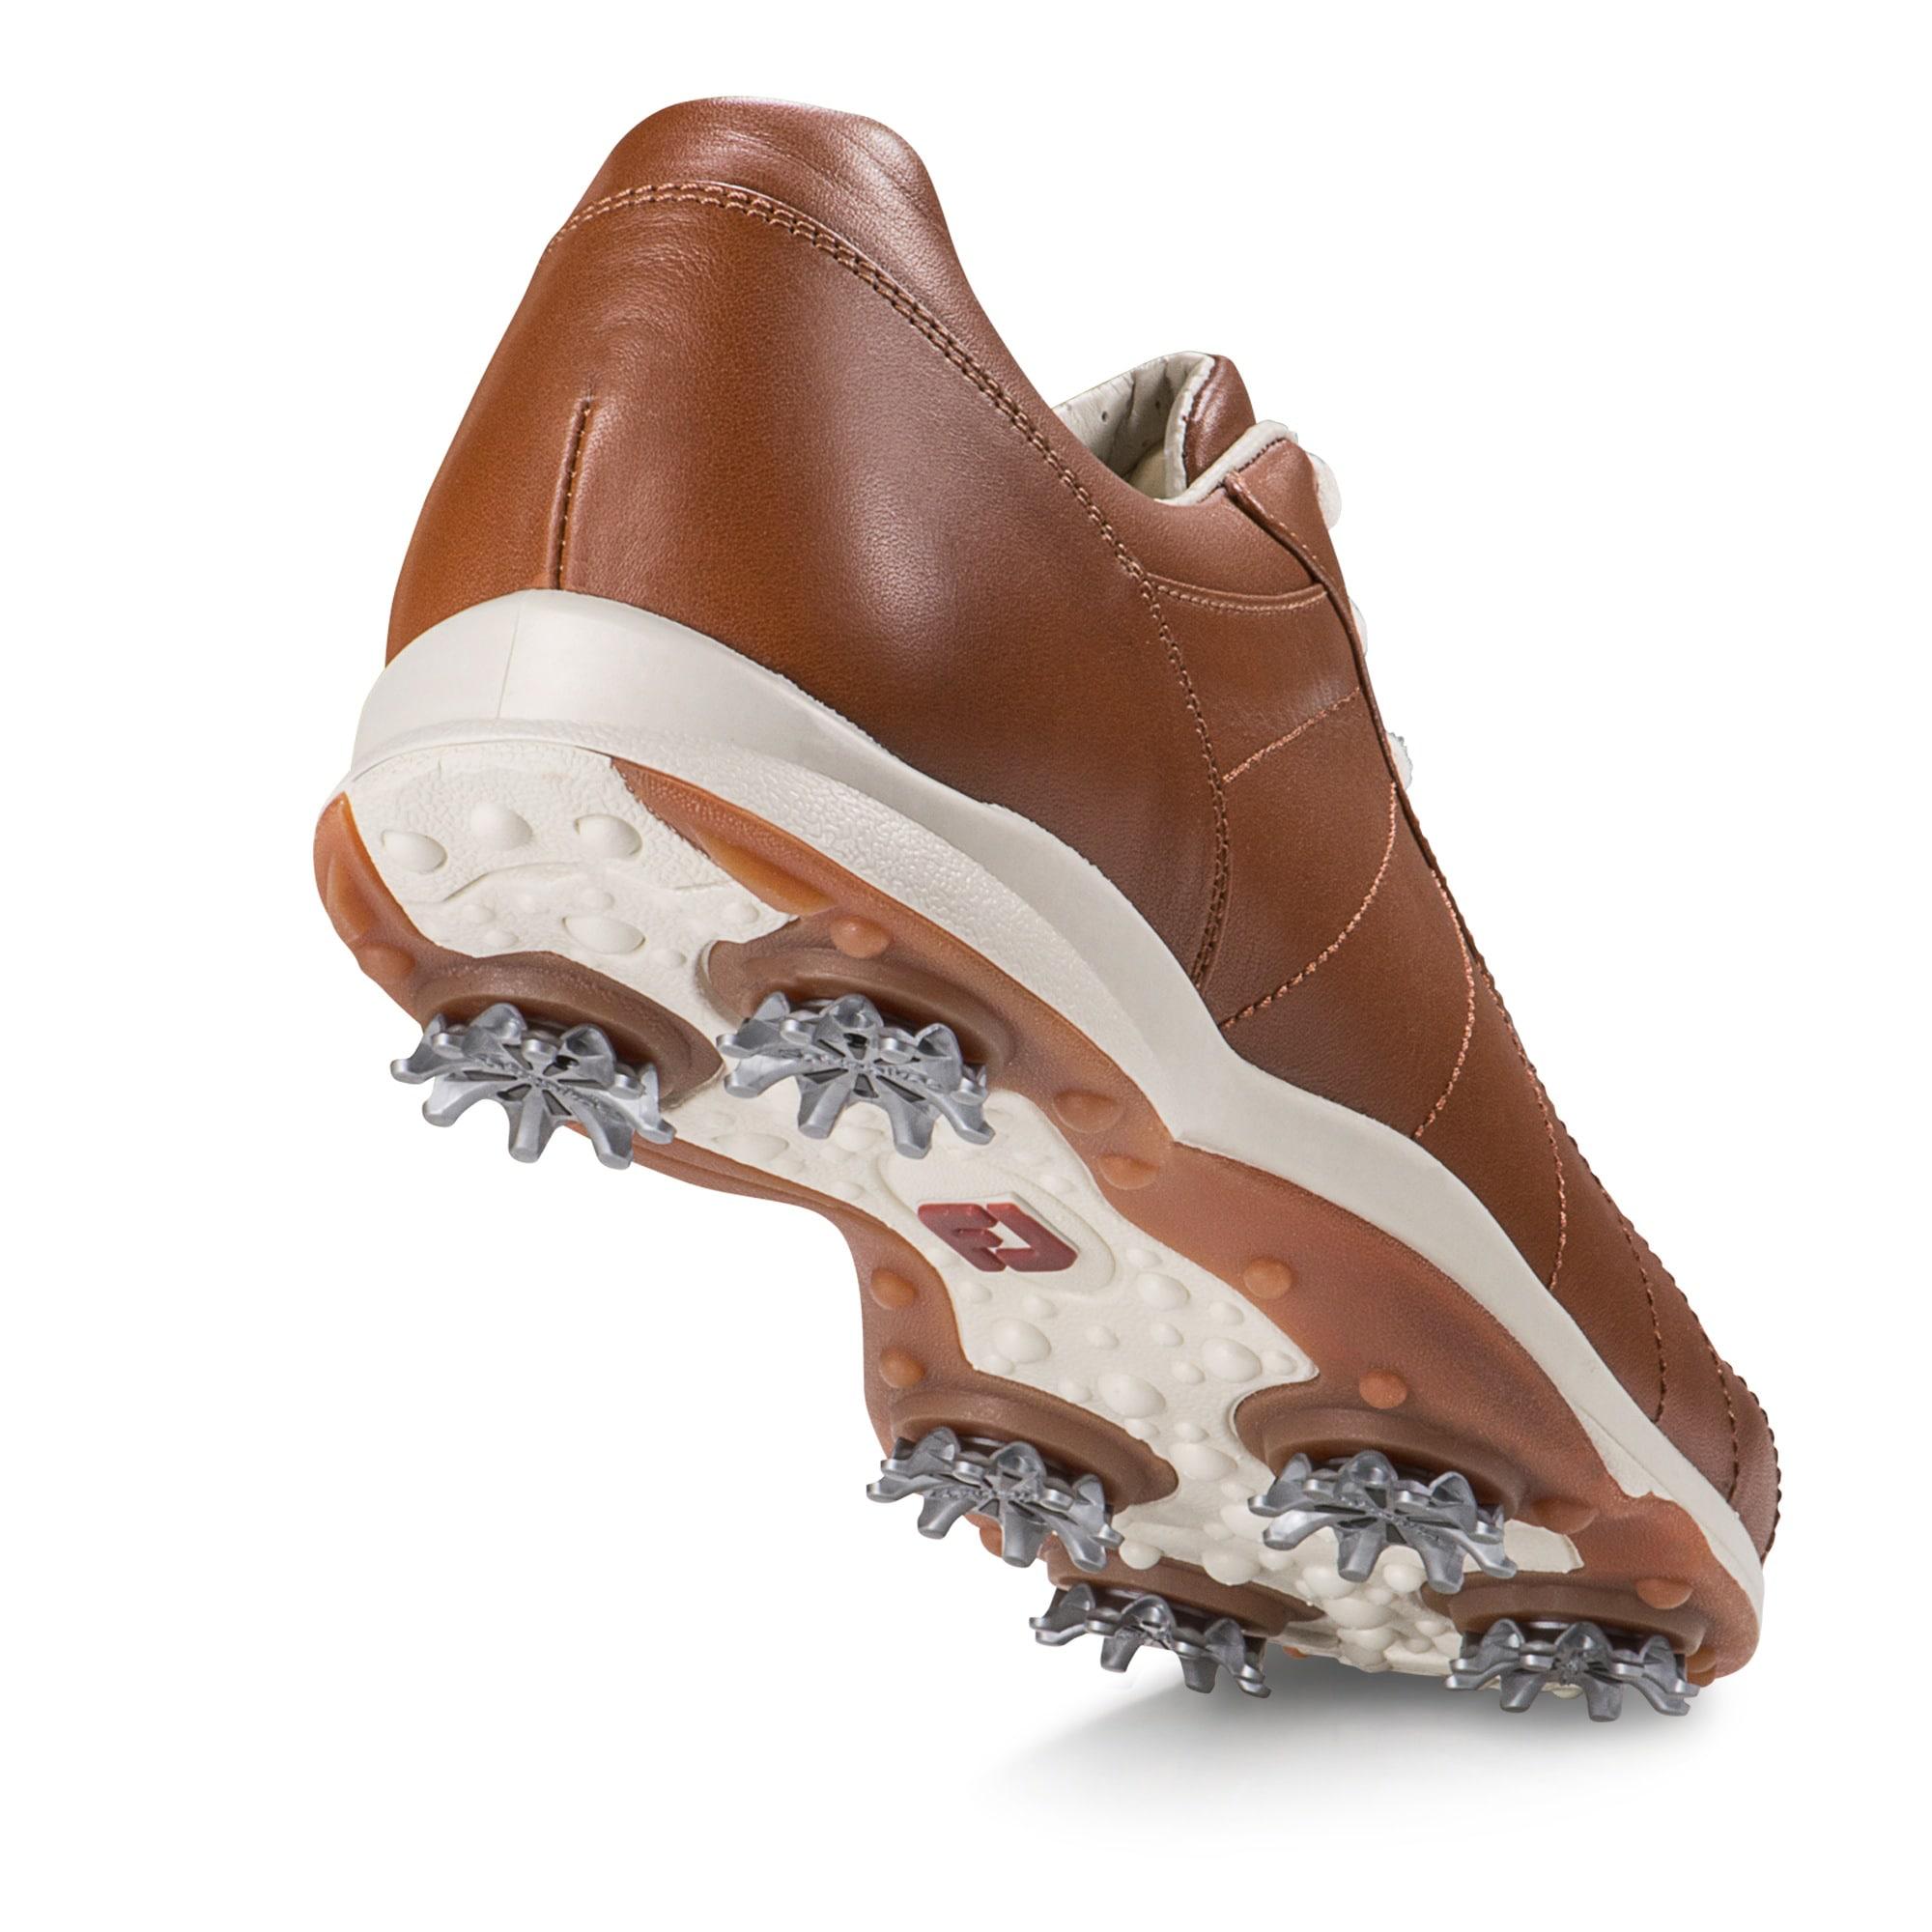 emBODY Golf Shoes for Women | FootJoy